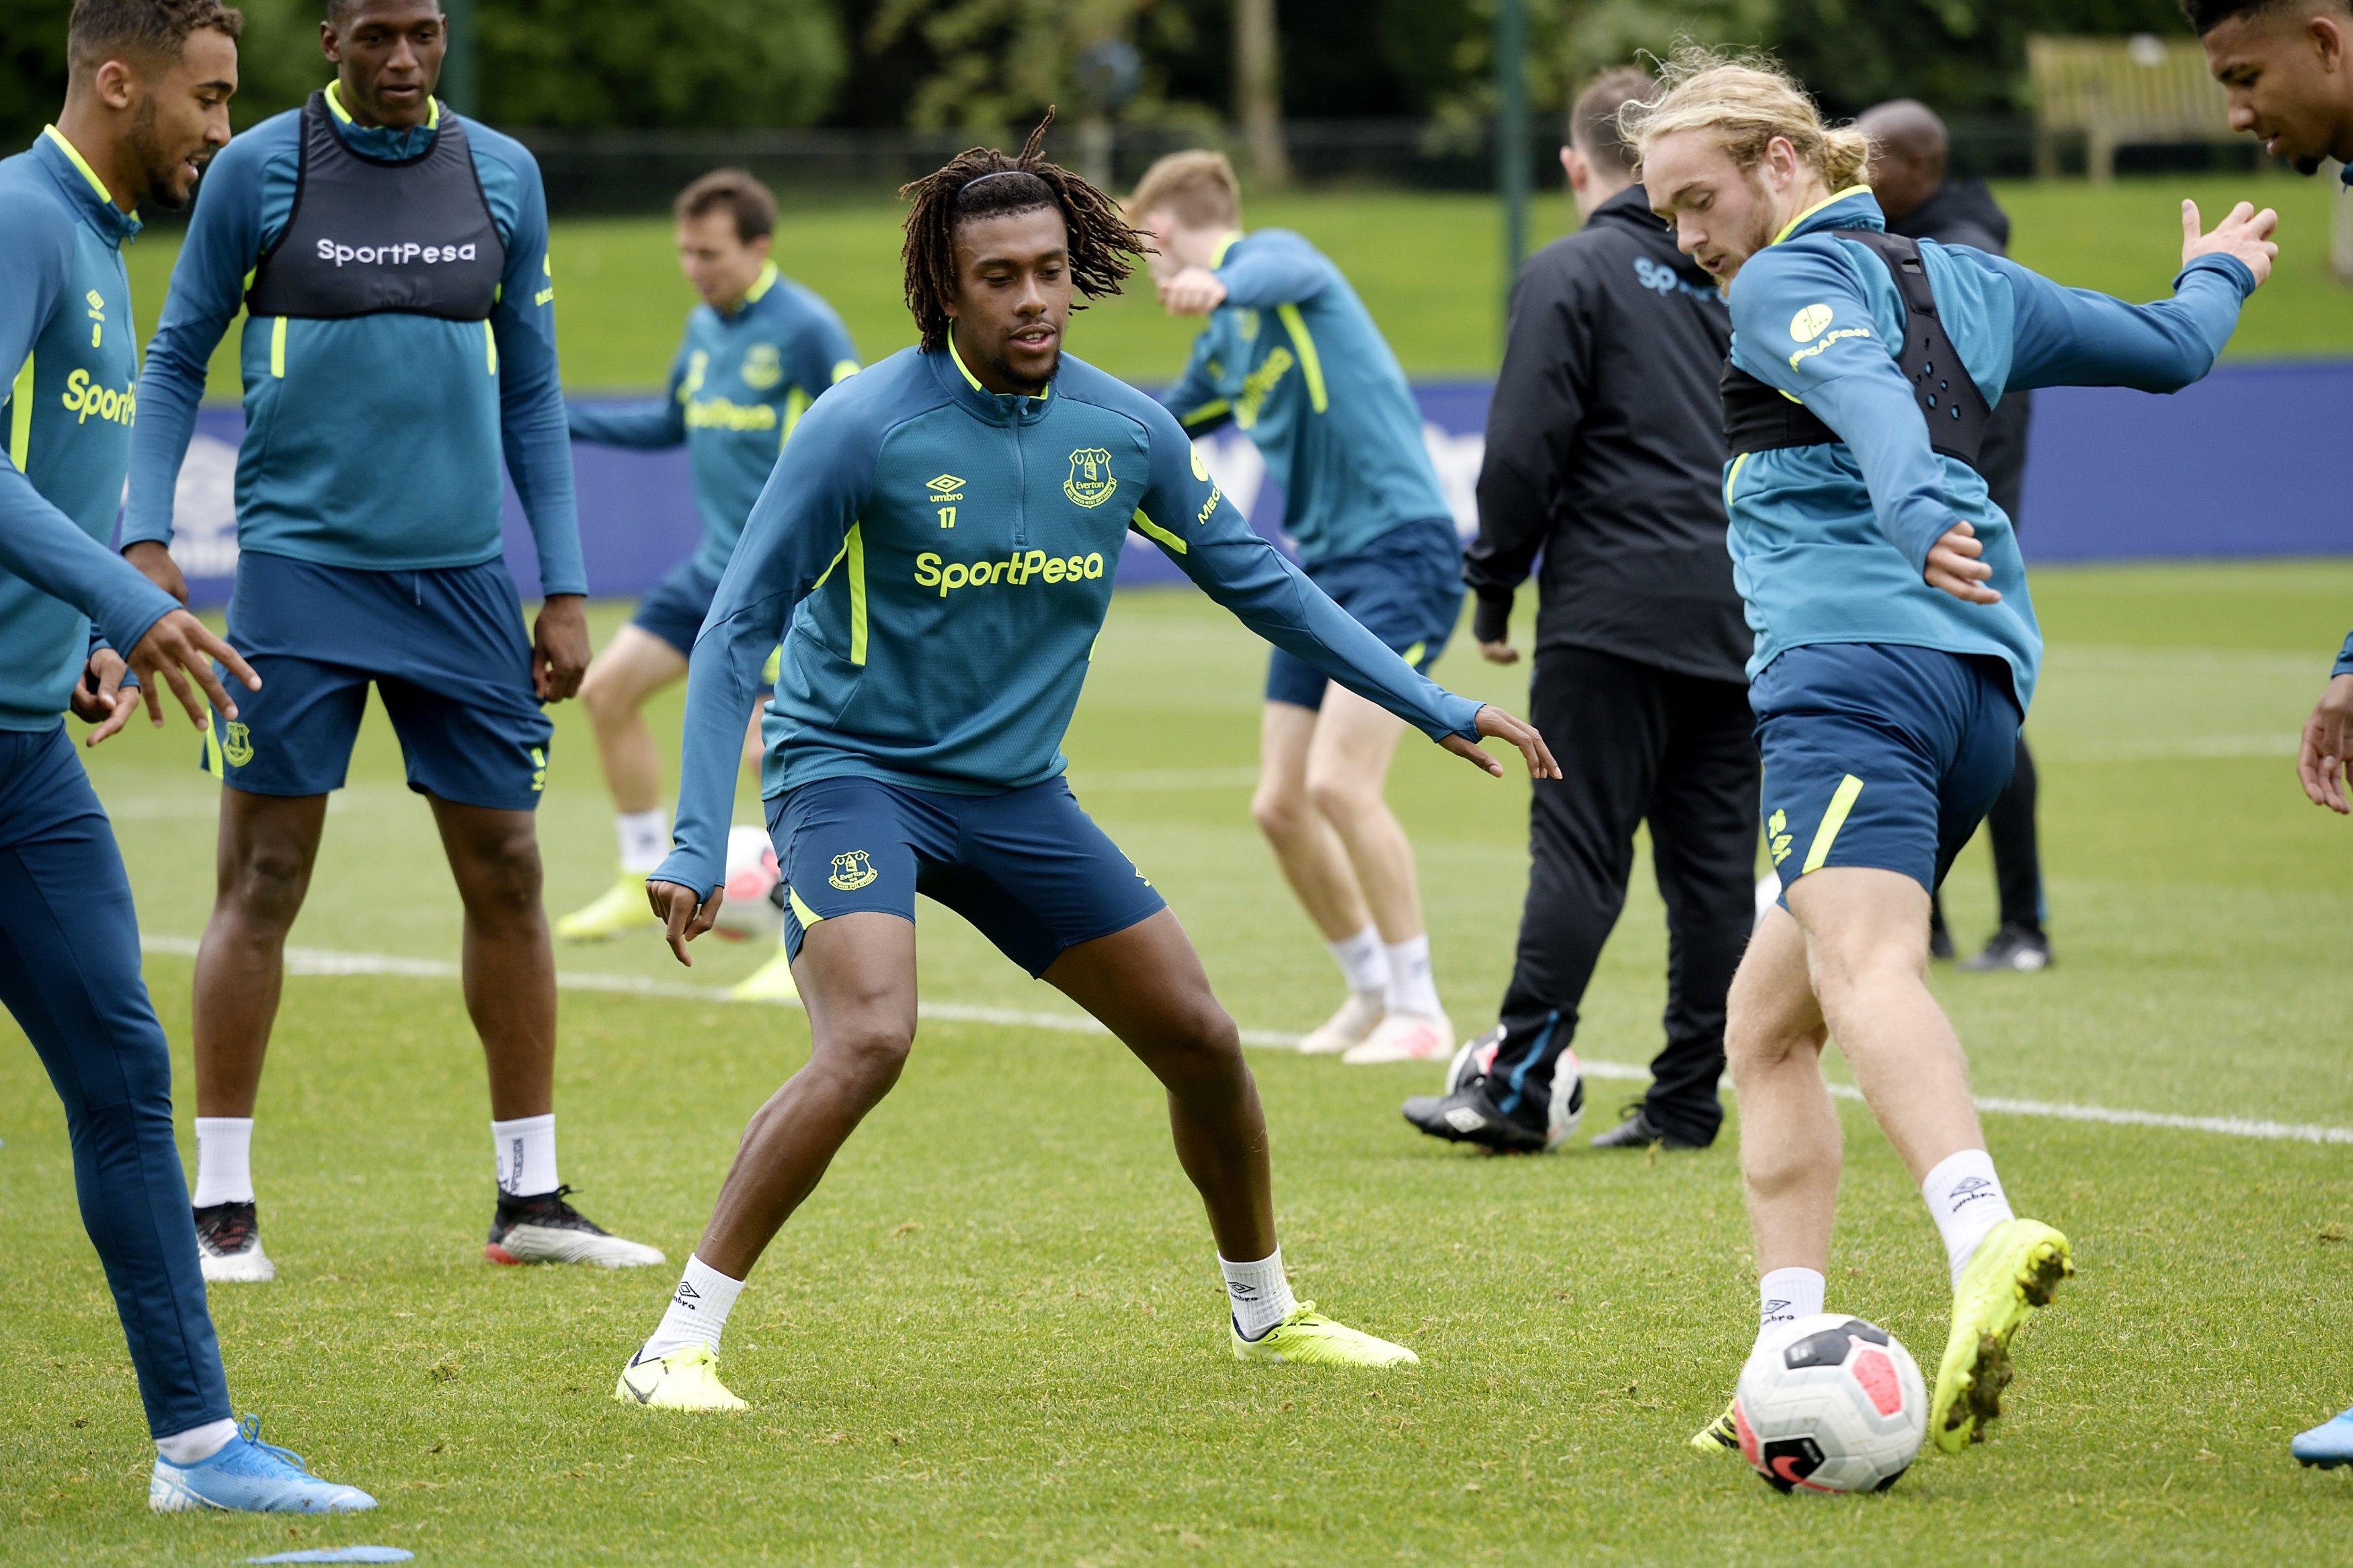 Marco Silva says Iwobi not ready for Everton debut